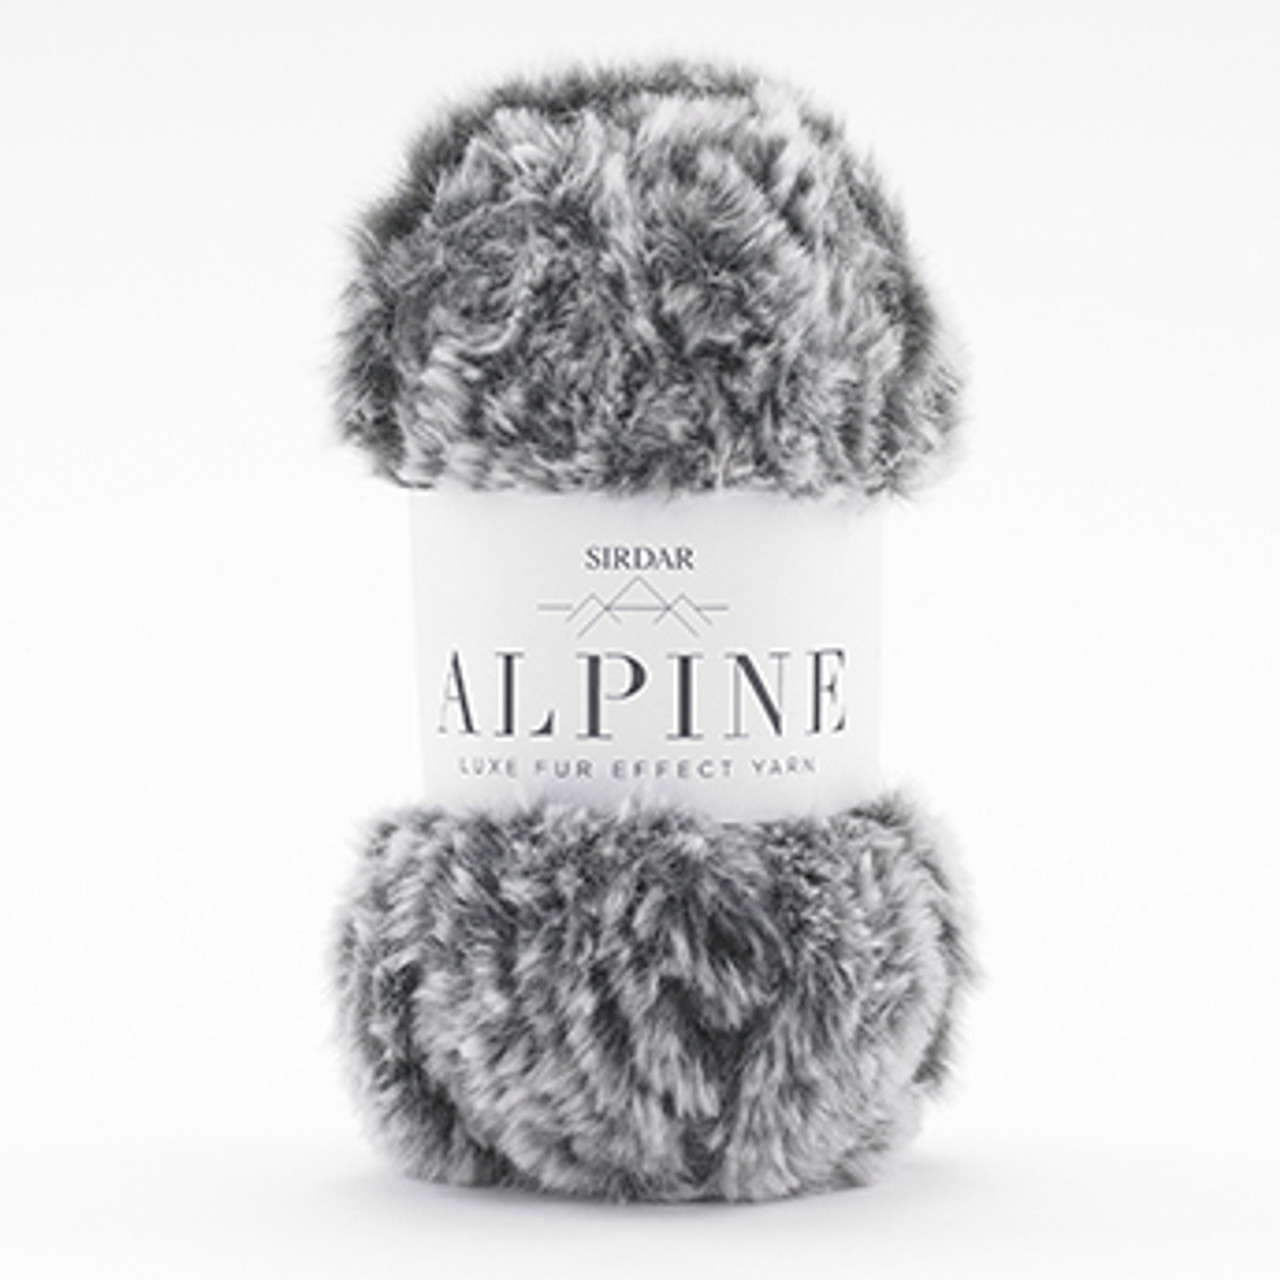 Sirdar Yarn - Alpine - silky silky fur like plush